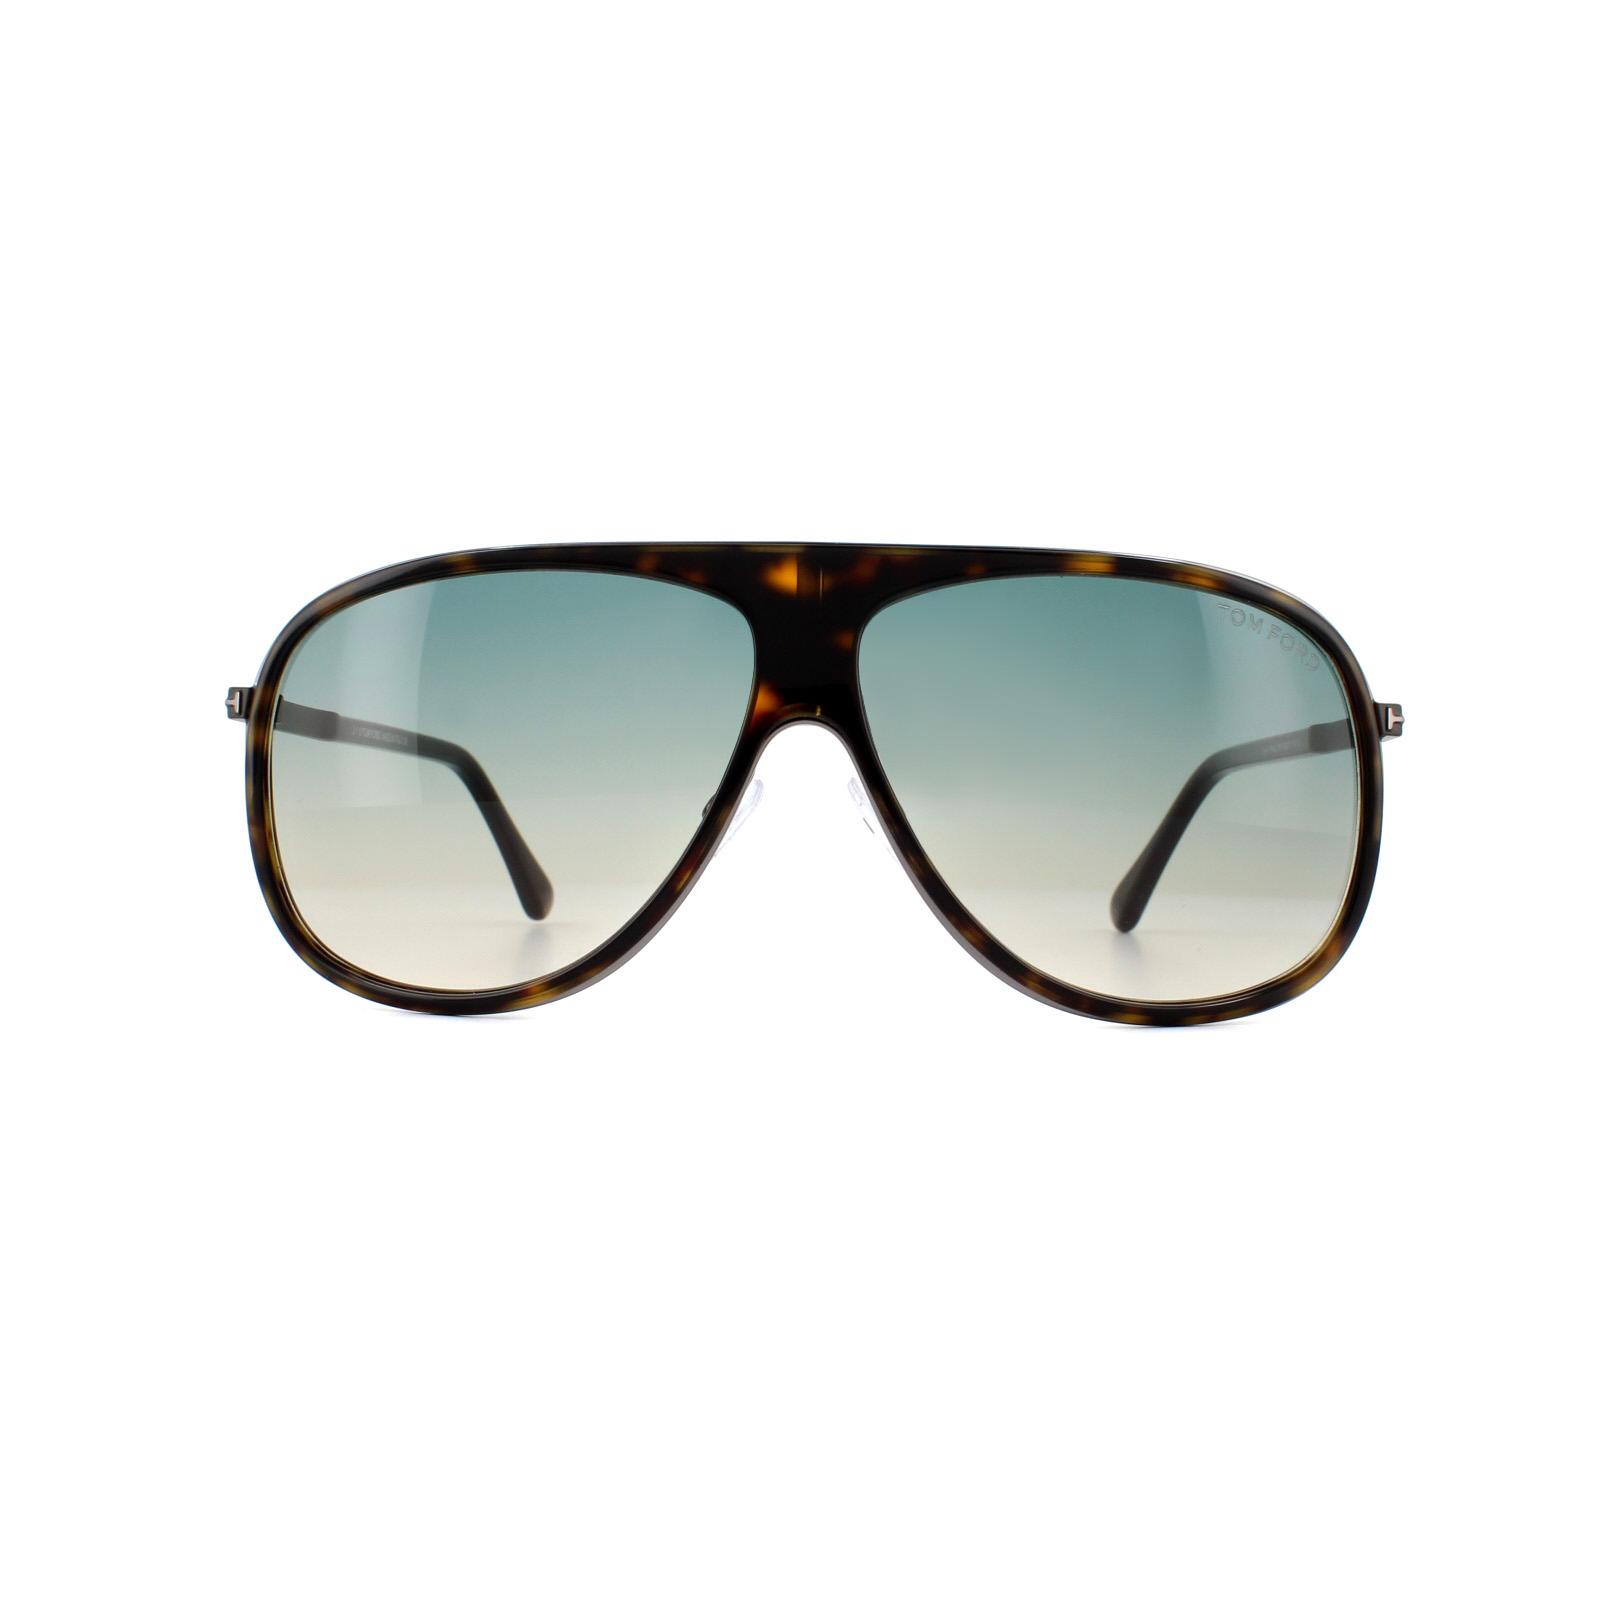 8ba0280898f Sentinel Tom Ford Sunglasses 0462 Chris 56P Havana Black Green Gradient